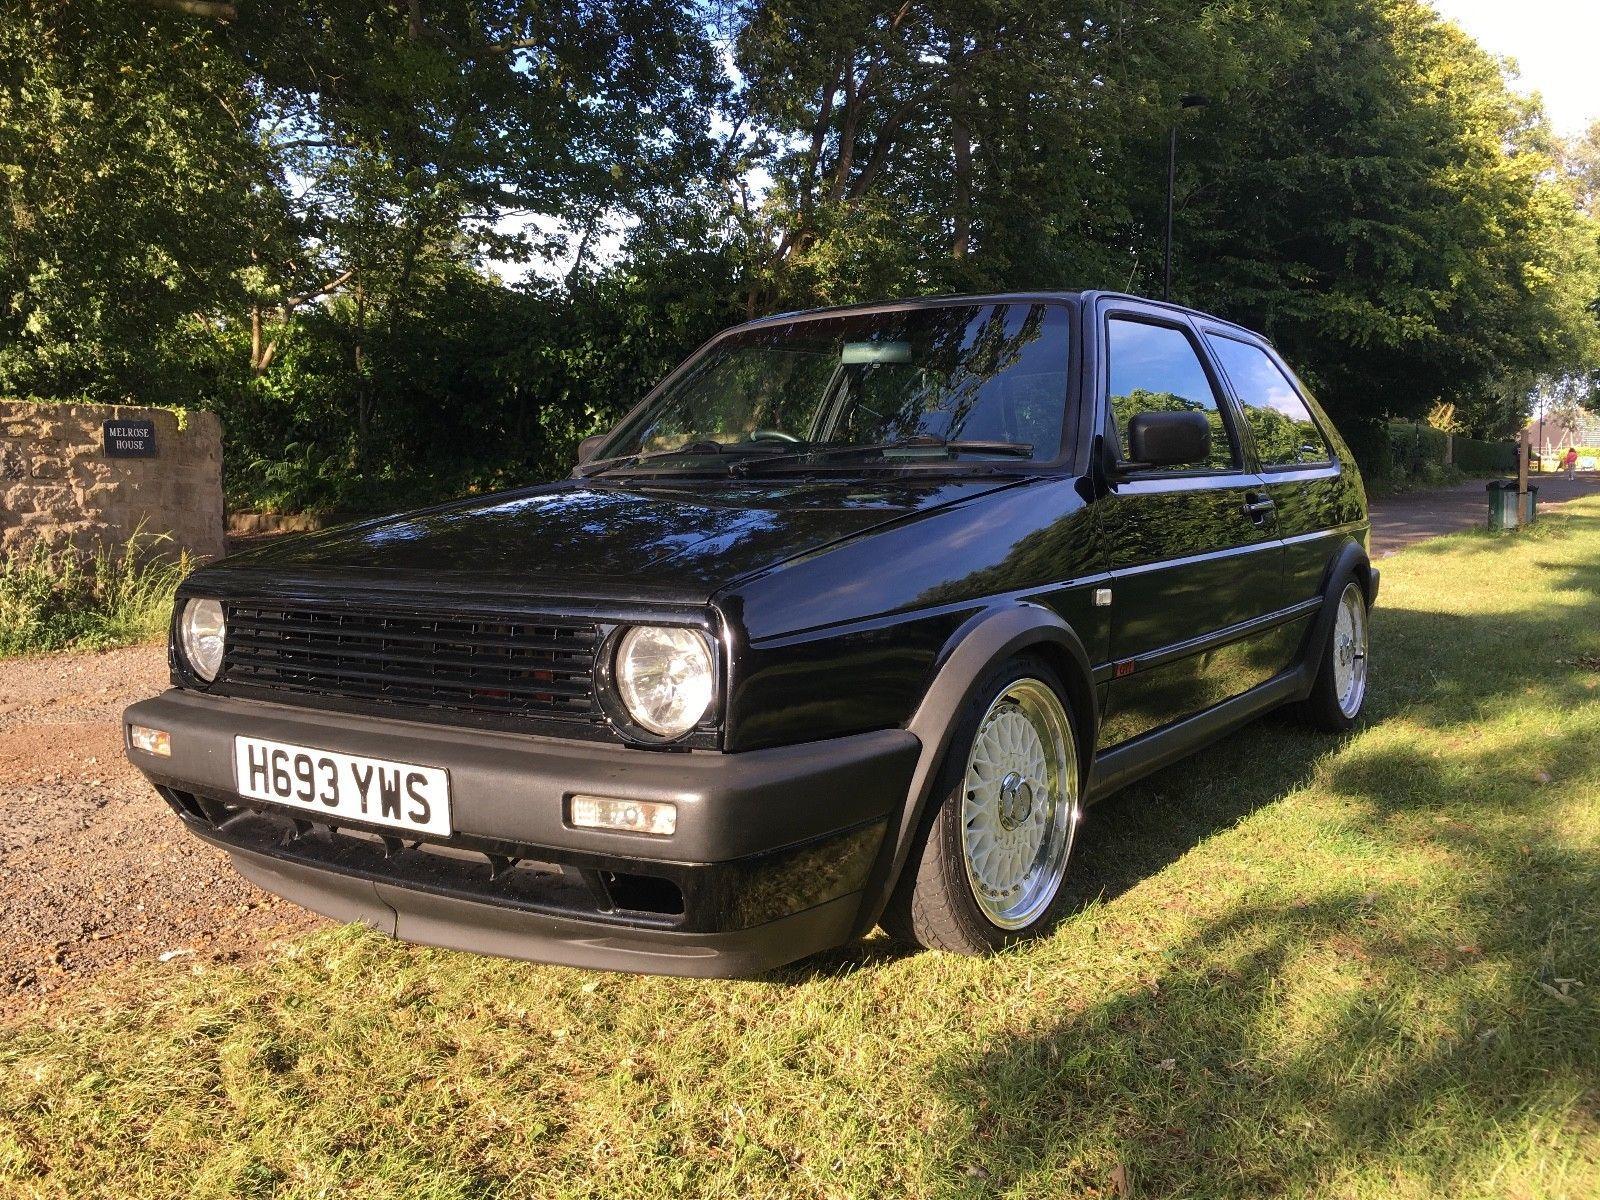 Vw Mk2 Golf Gti 8v 1990 Schwarz Black Pinterest And Volkswagen Ebay 1990s Cars